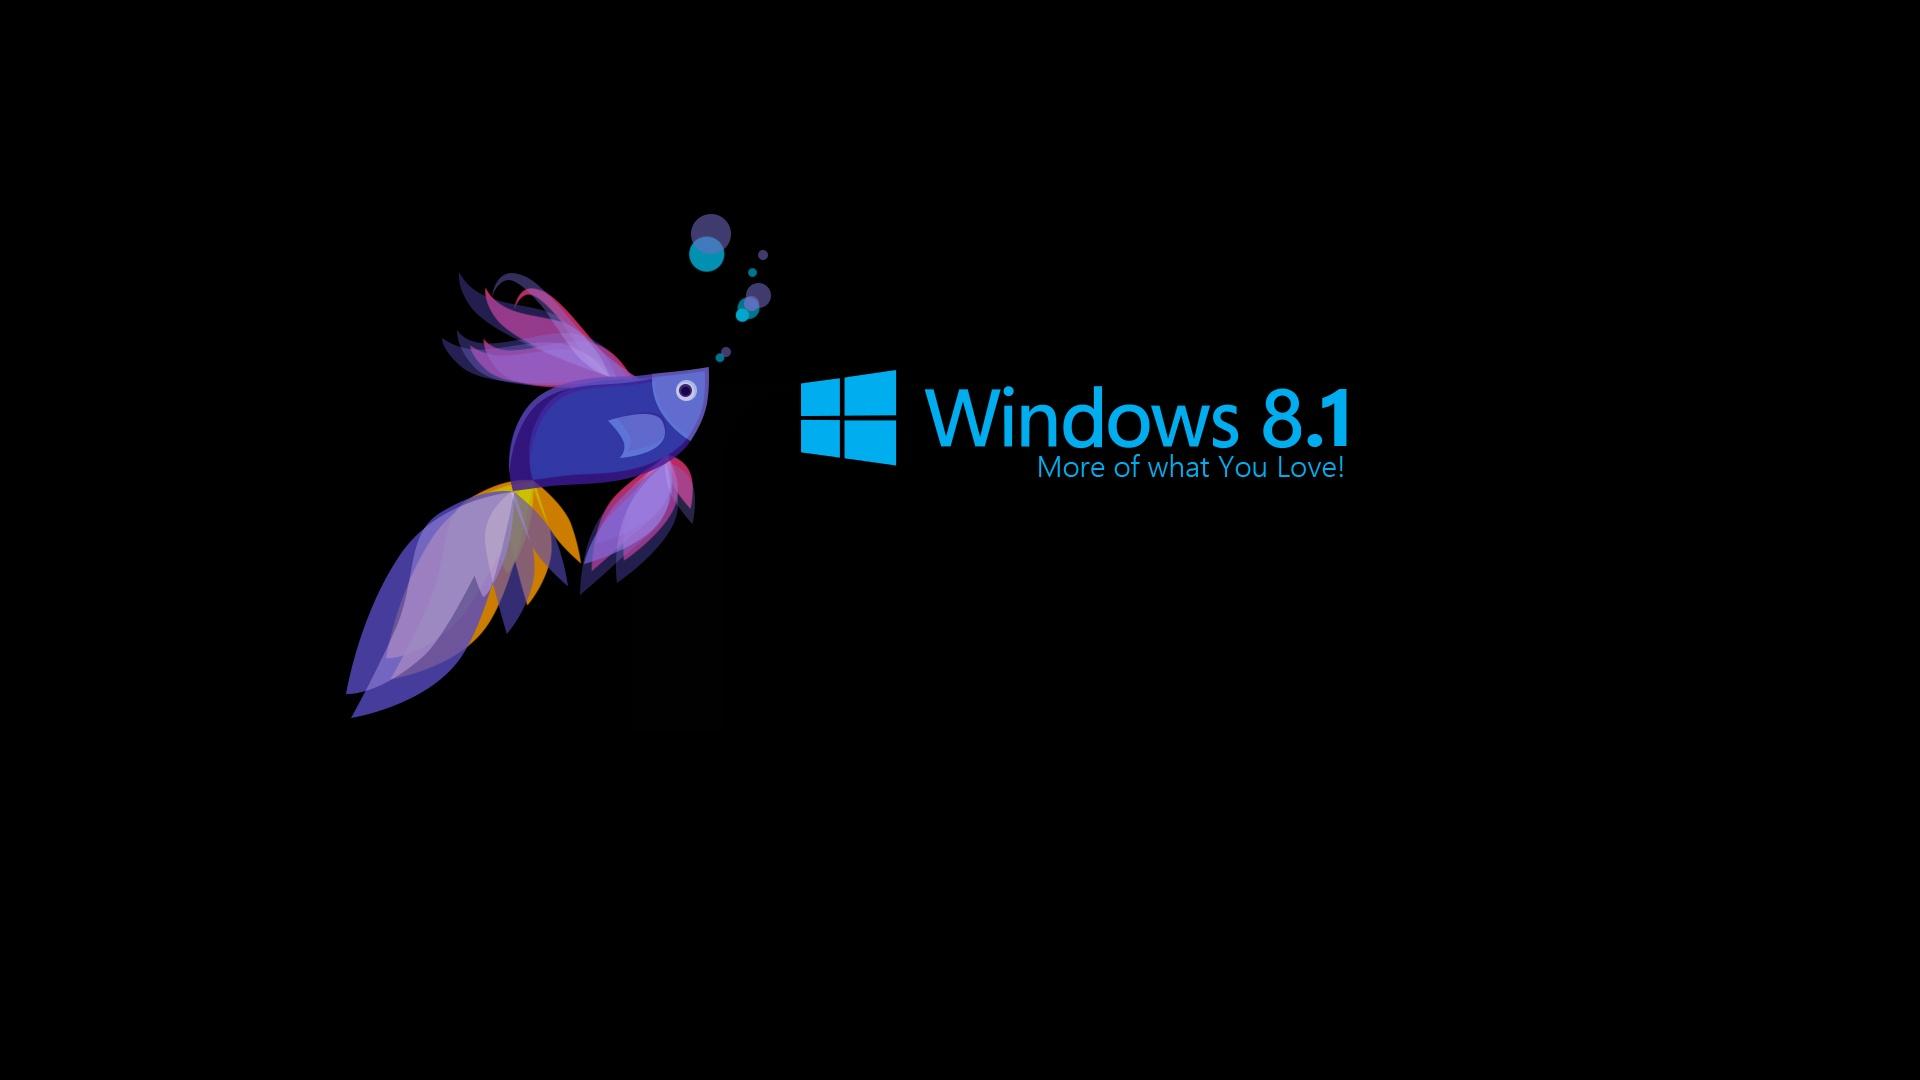 Wallpaper Windows 8  № 1929056 без смс